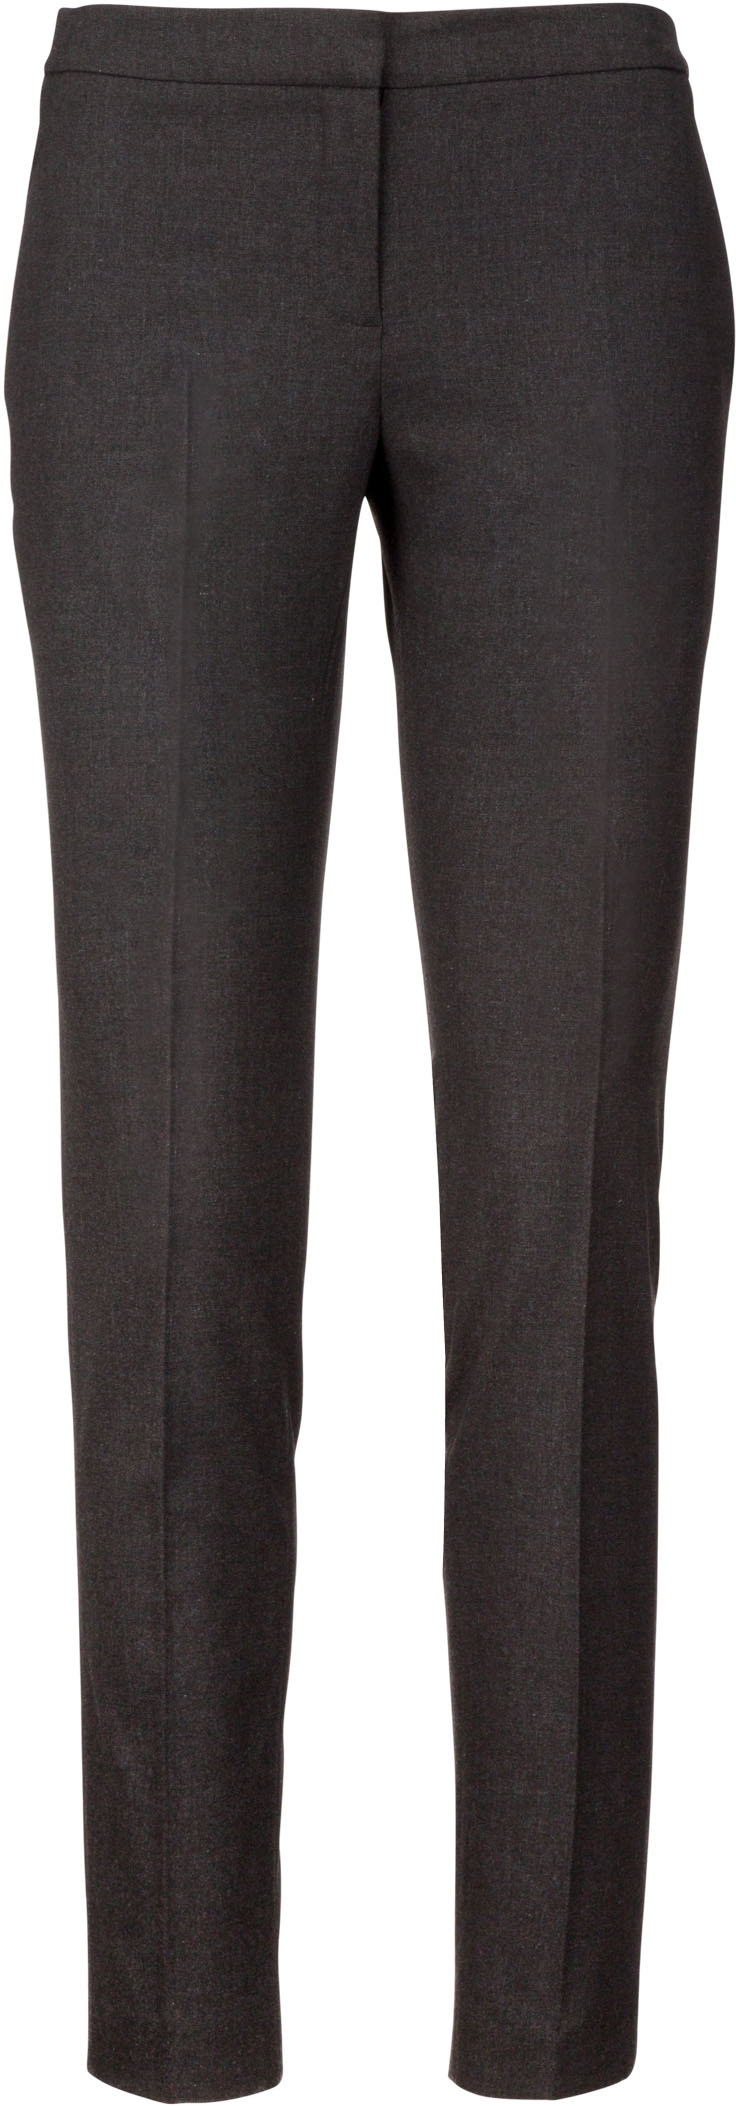 Pantalon femme - 2-1493-3